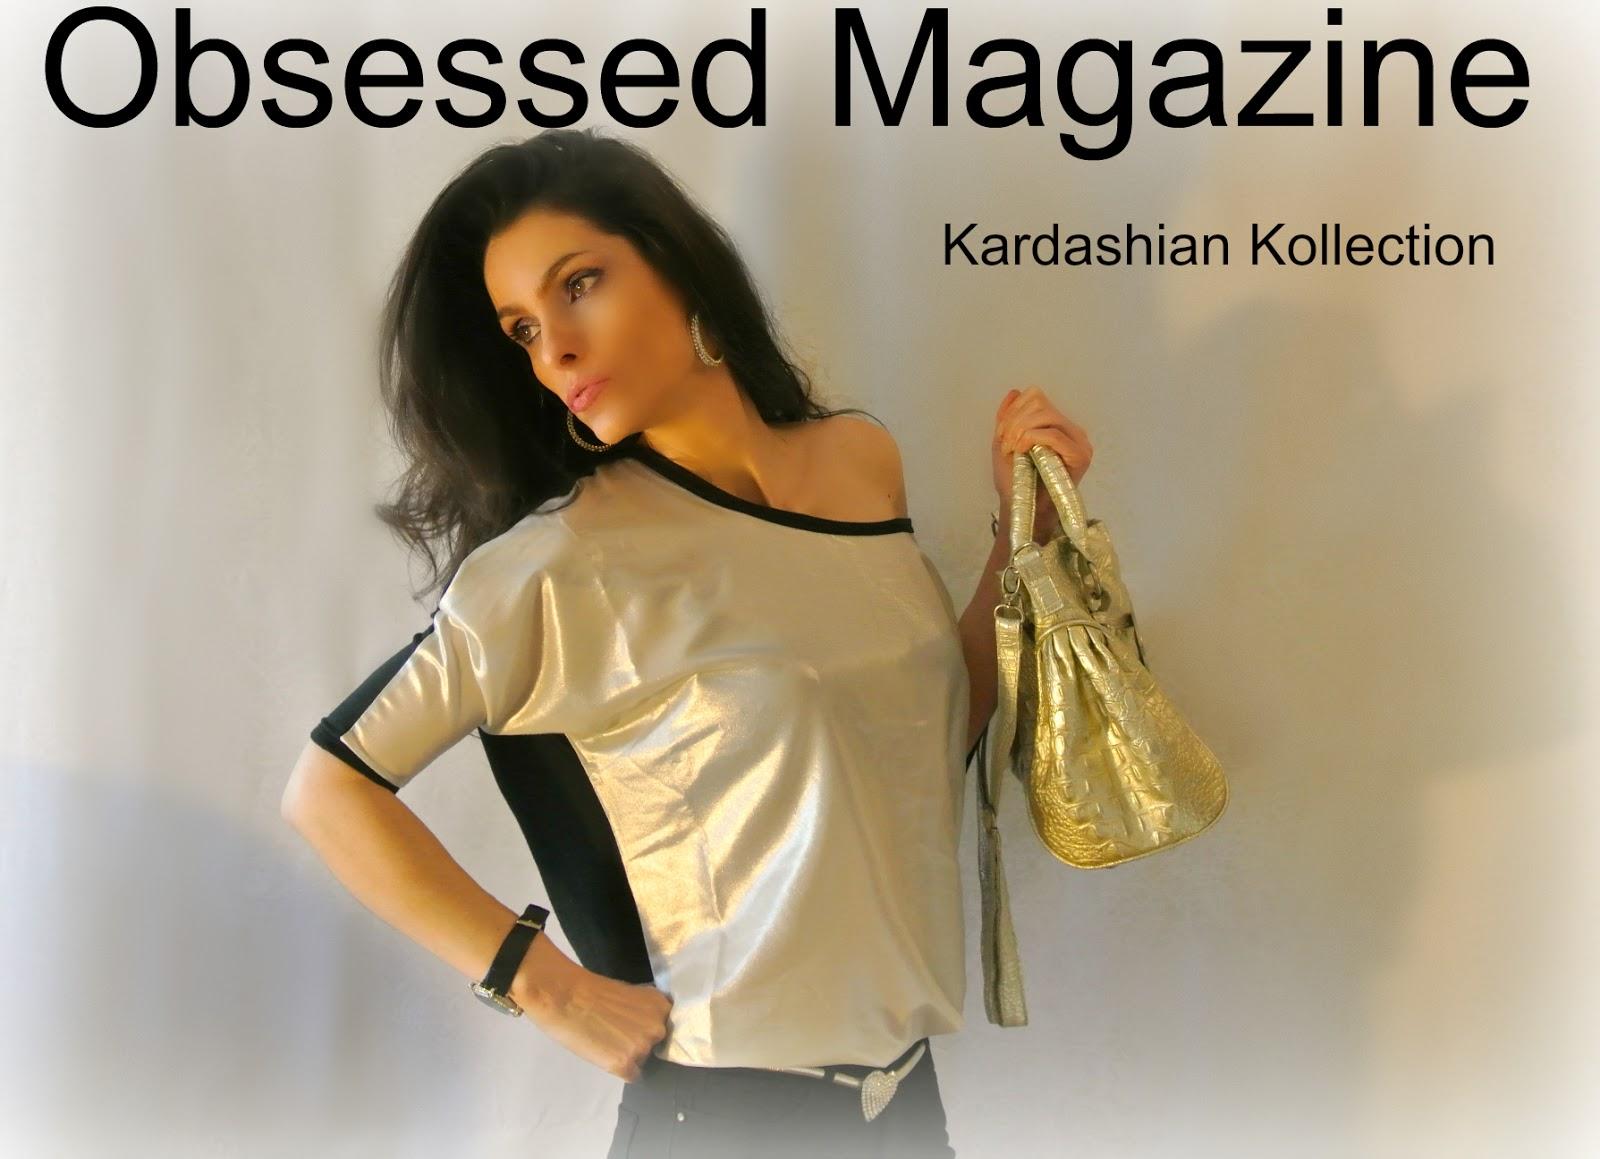 Kardashian Kollection Sale Hurry